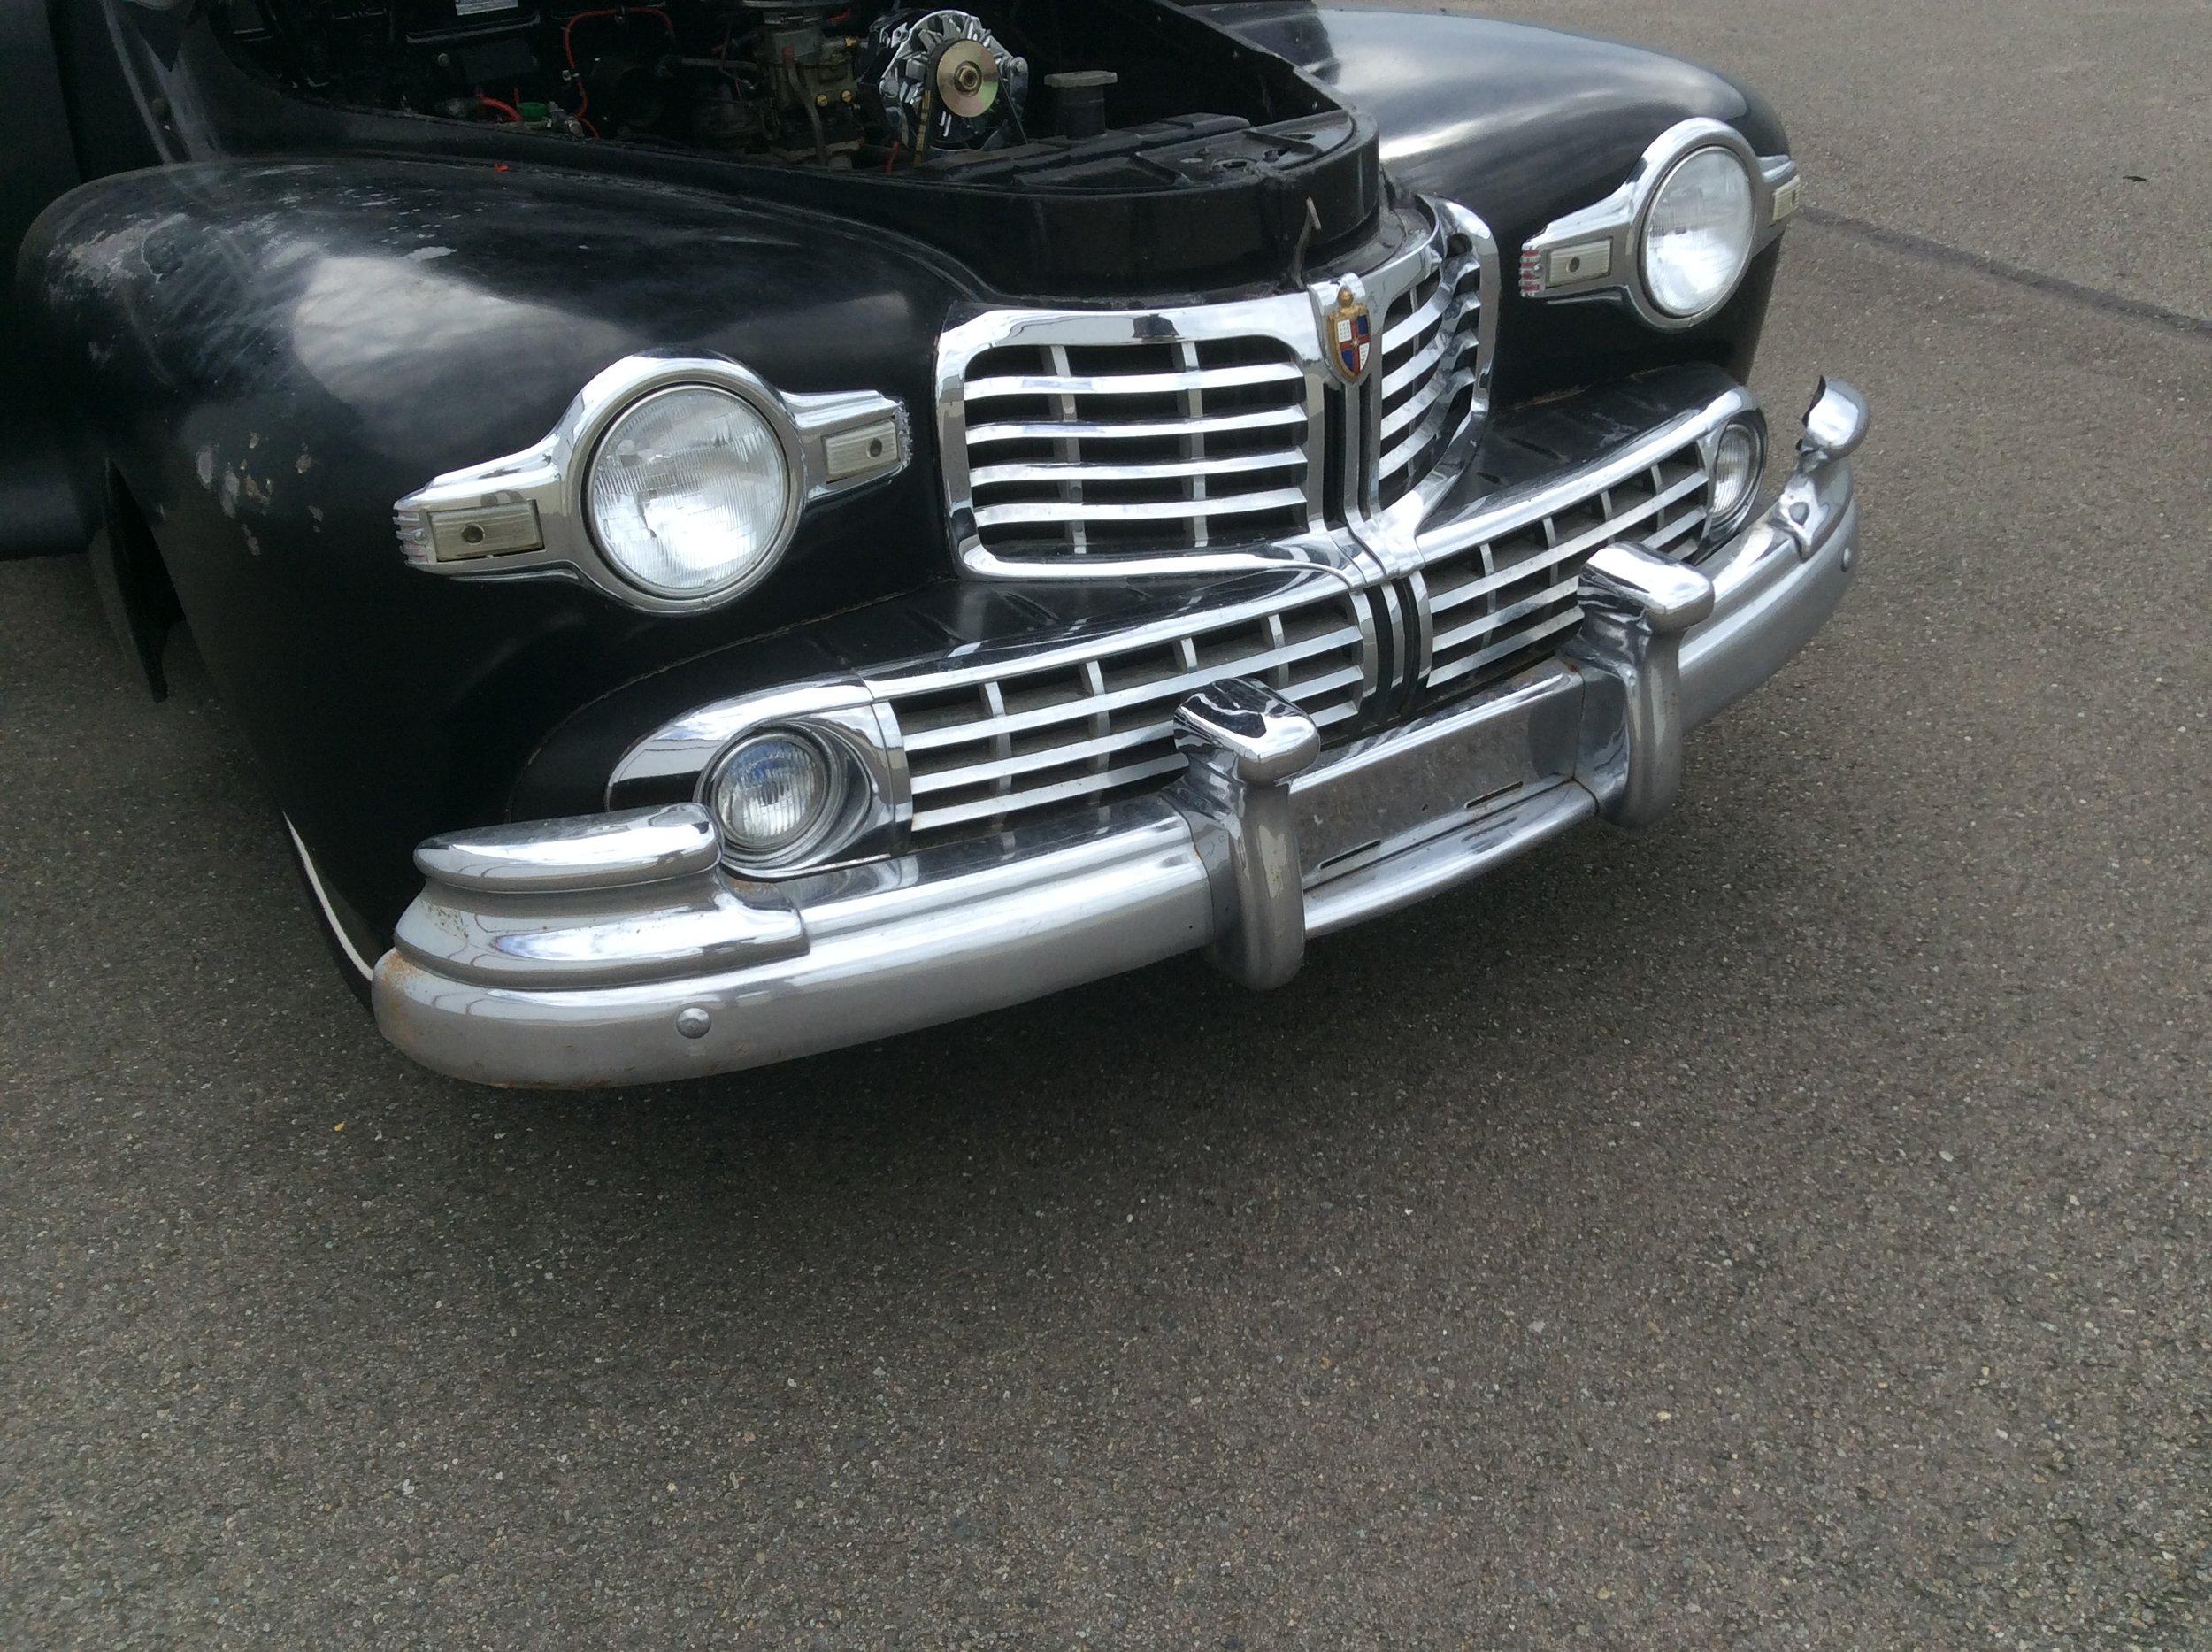 1948 Lincoln Zephyr (103).JPG